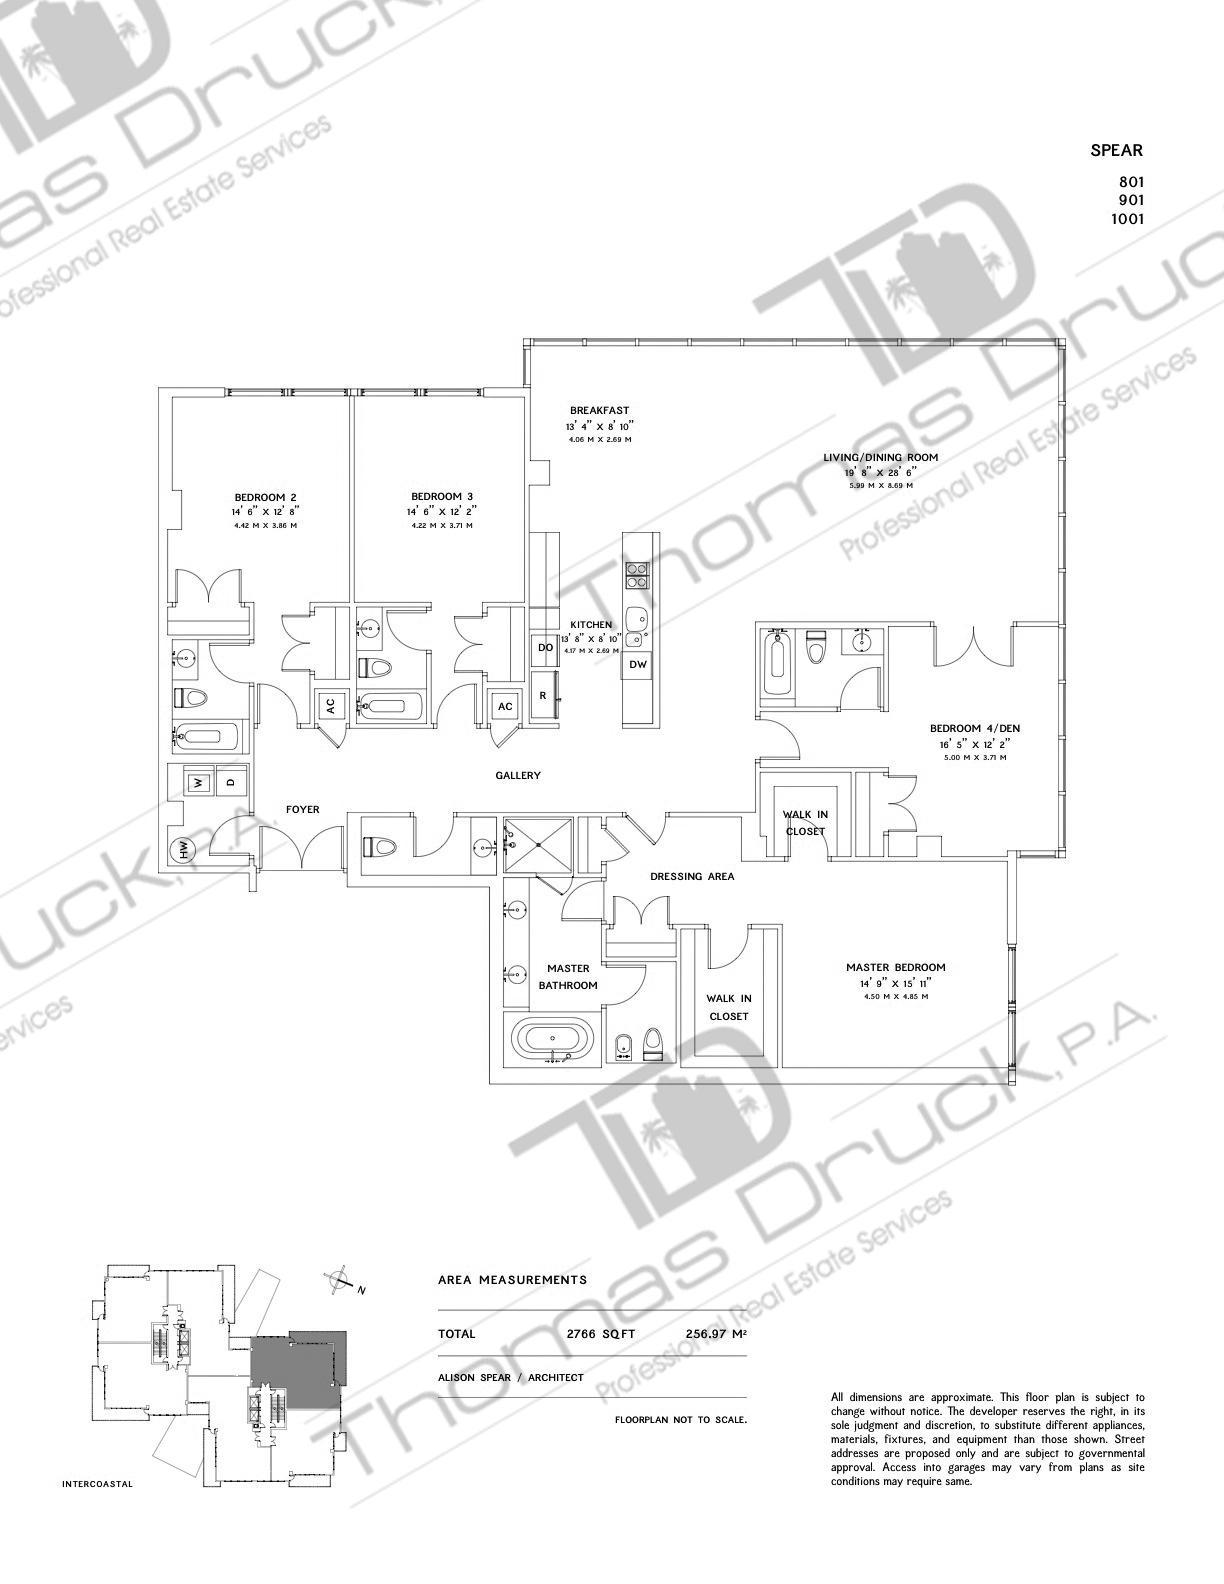 aqua spear miami immobilien immobilien in miami deutscher immobilienmakler. Black Bedroom Furniture Sets. Home Design Ideas